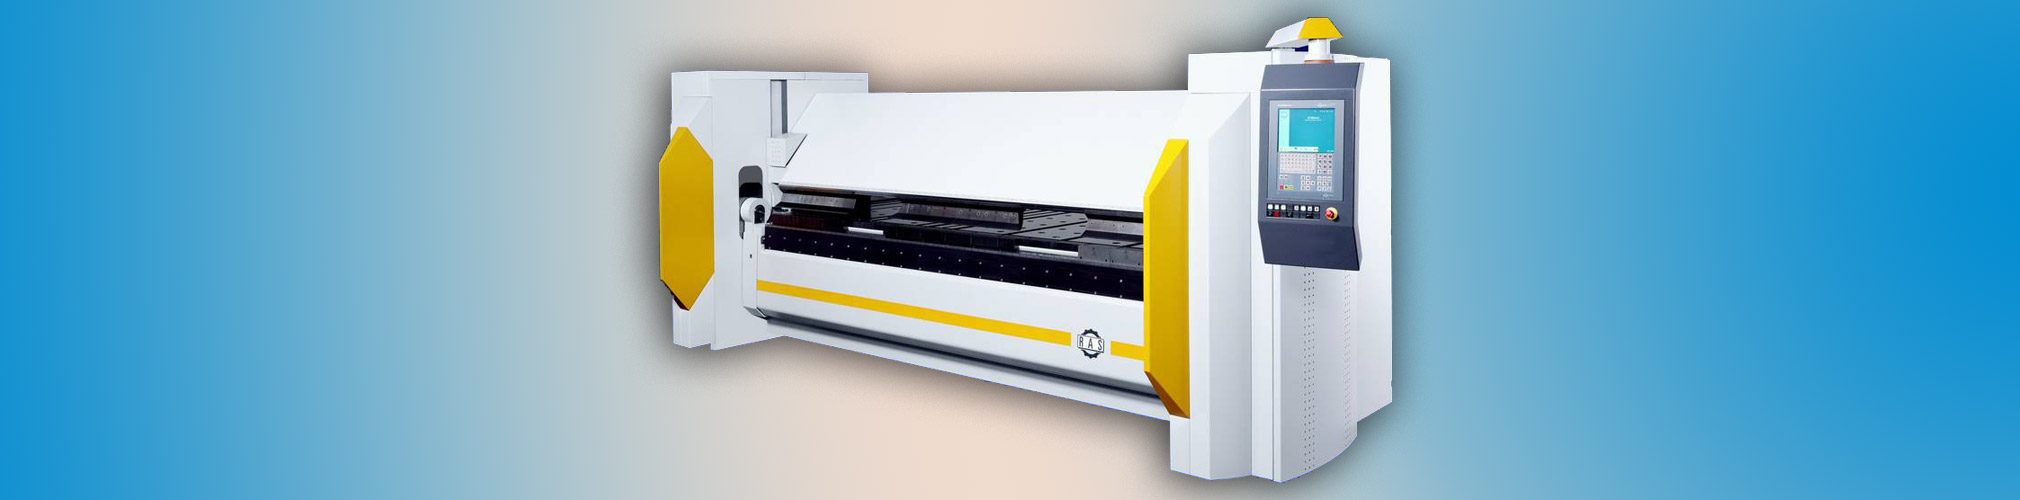 metall.nl kantpers guillotineschaar ponsmachine ponsautomaat plasmasnijder buigmachine zwenkbuigmachine FLEXIbend multibend